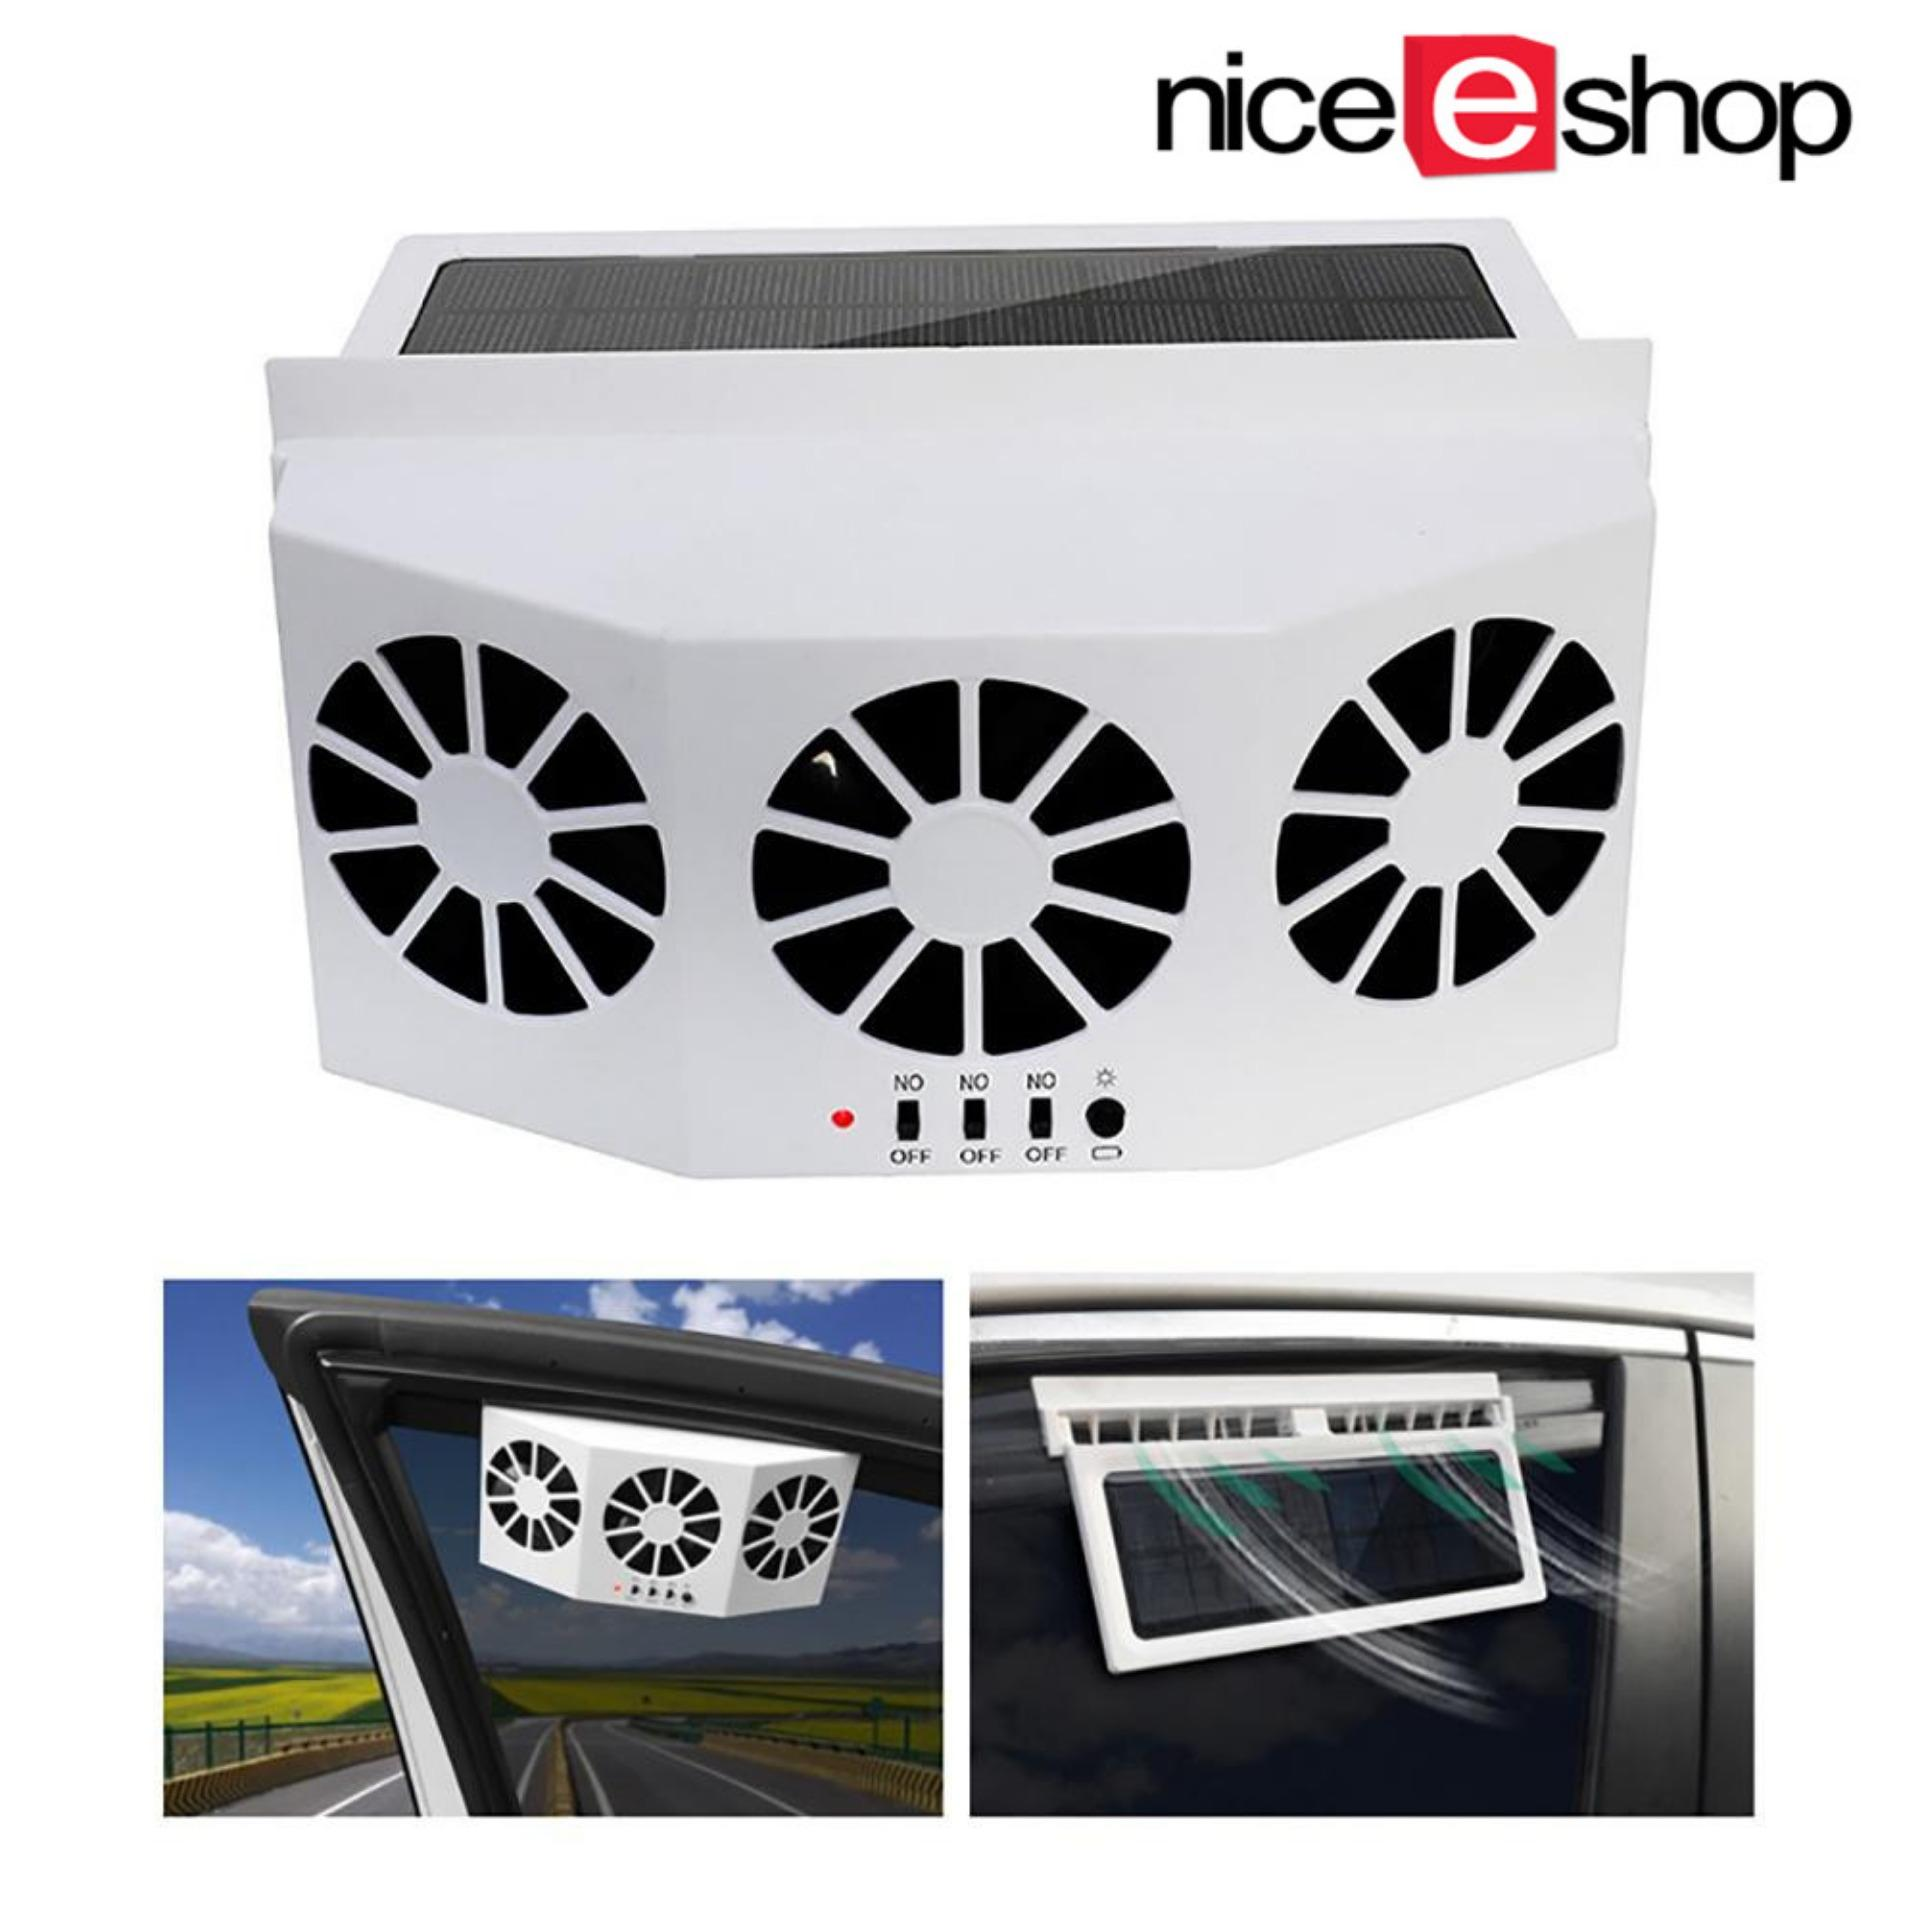 niceEshop Solar Powered Car Window Air Vent Ventilator Mini Air Conditioner  Cool Fan